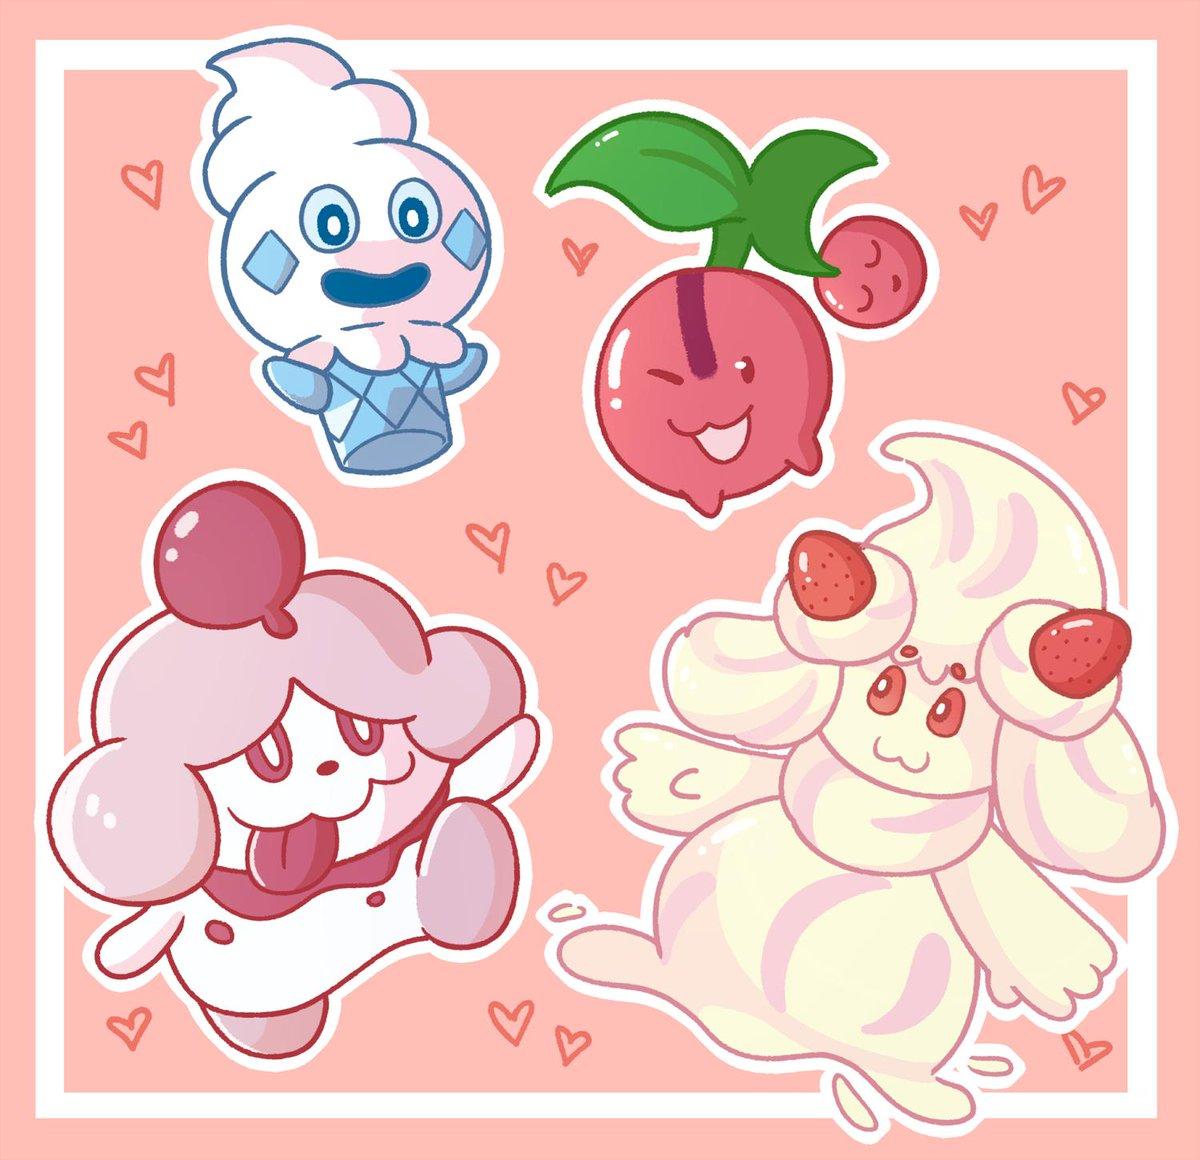 Who wants dessert? #PokemonSwordShield #Alcremie #myart<br>http://pic.twitter.com/1k4z6o3l3t